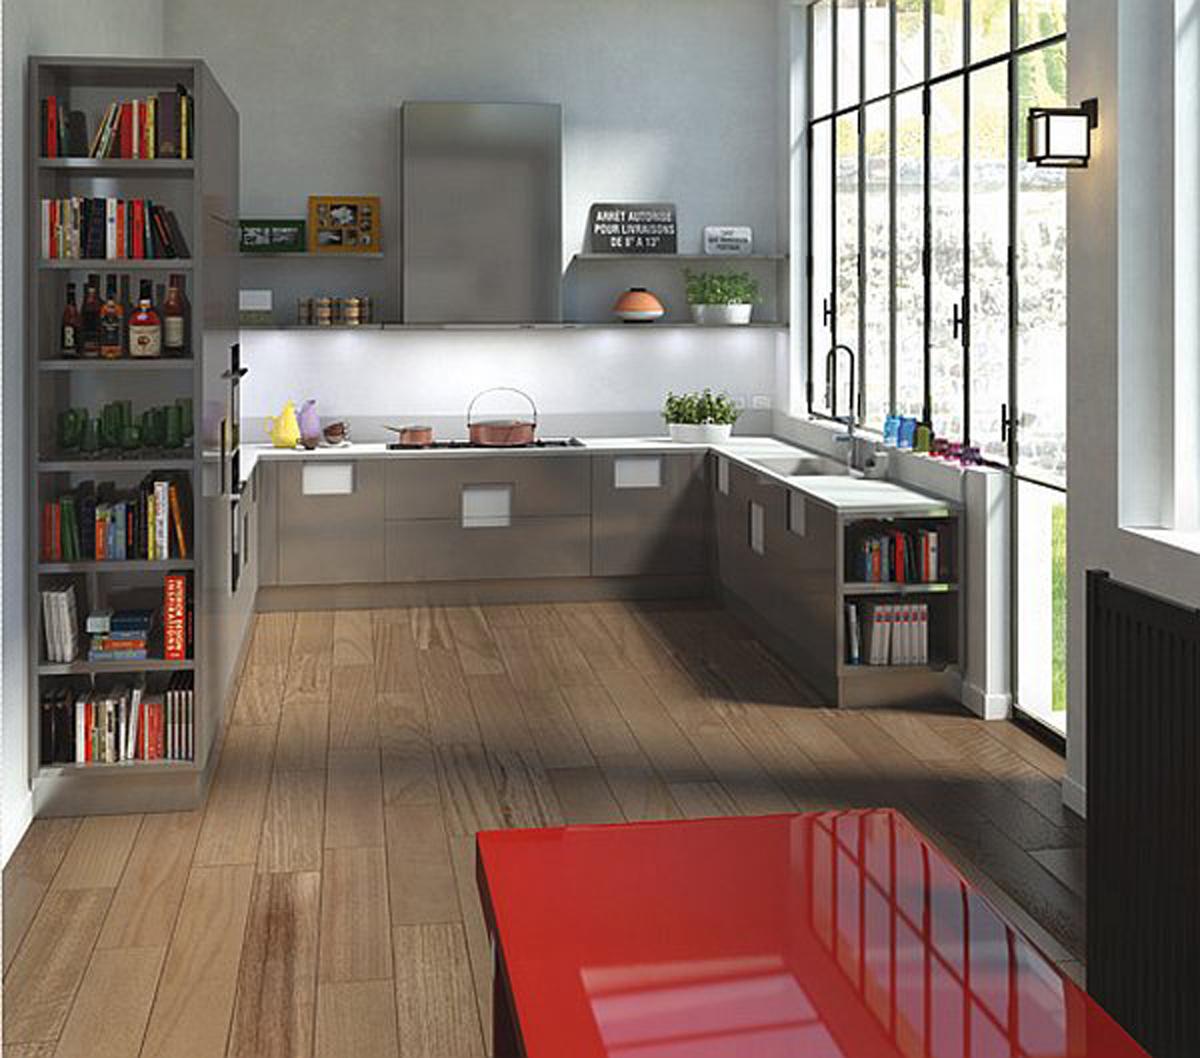 Space saving kitchen table - 10 Photos To Space Saving Kitchen Table